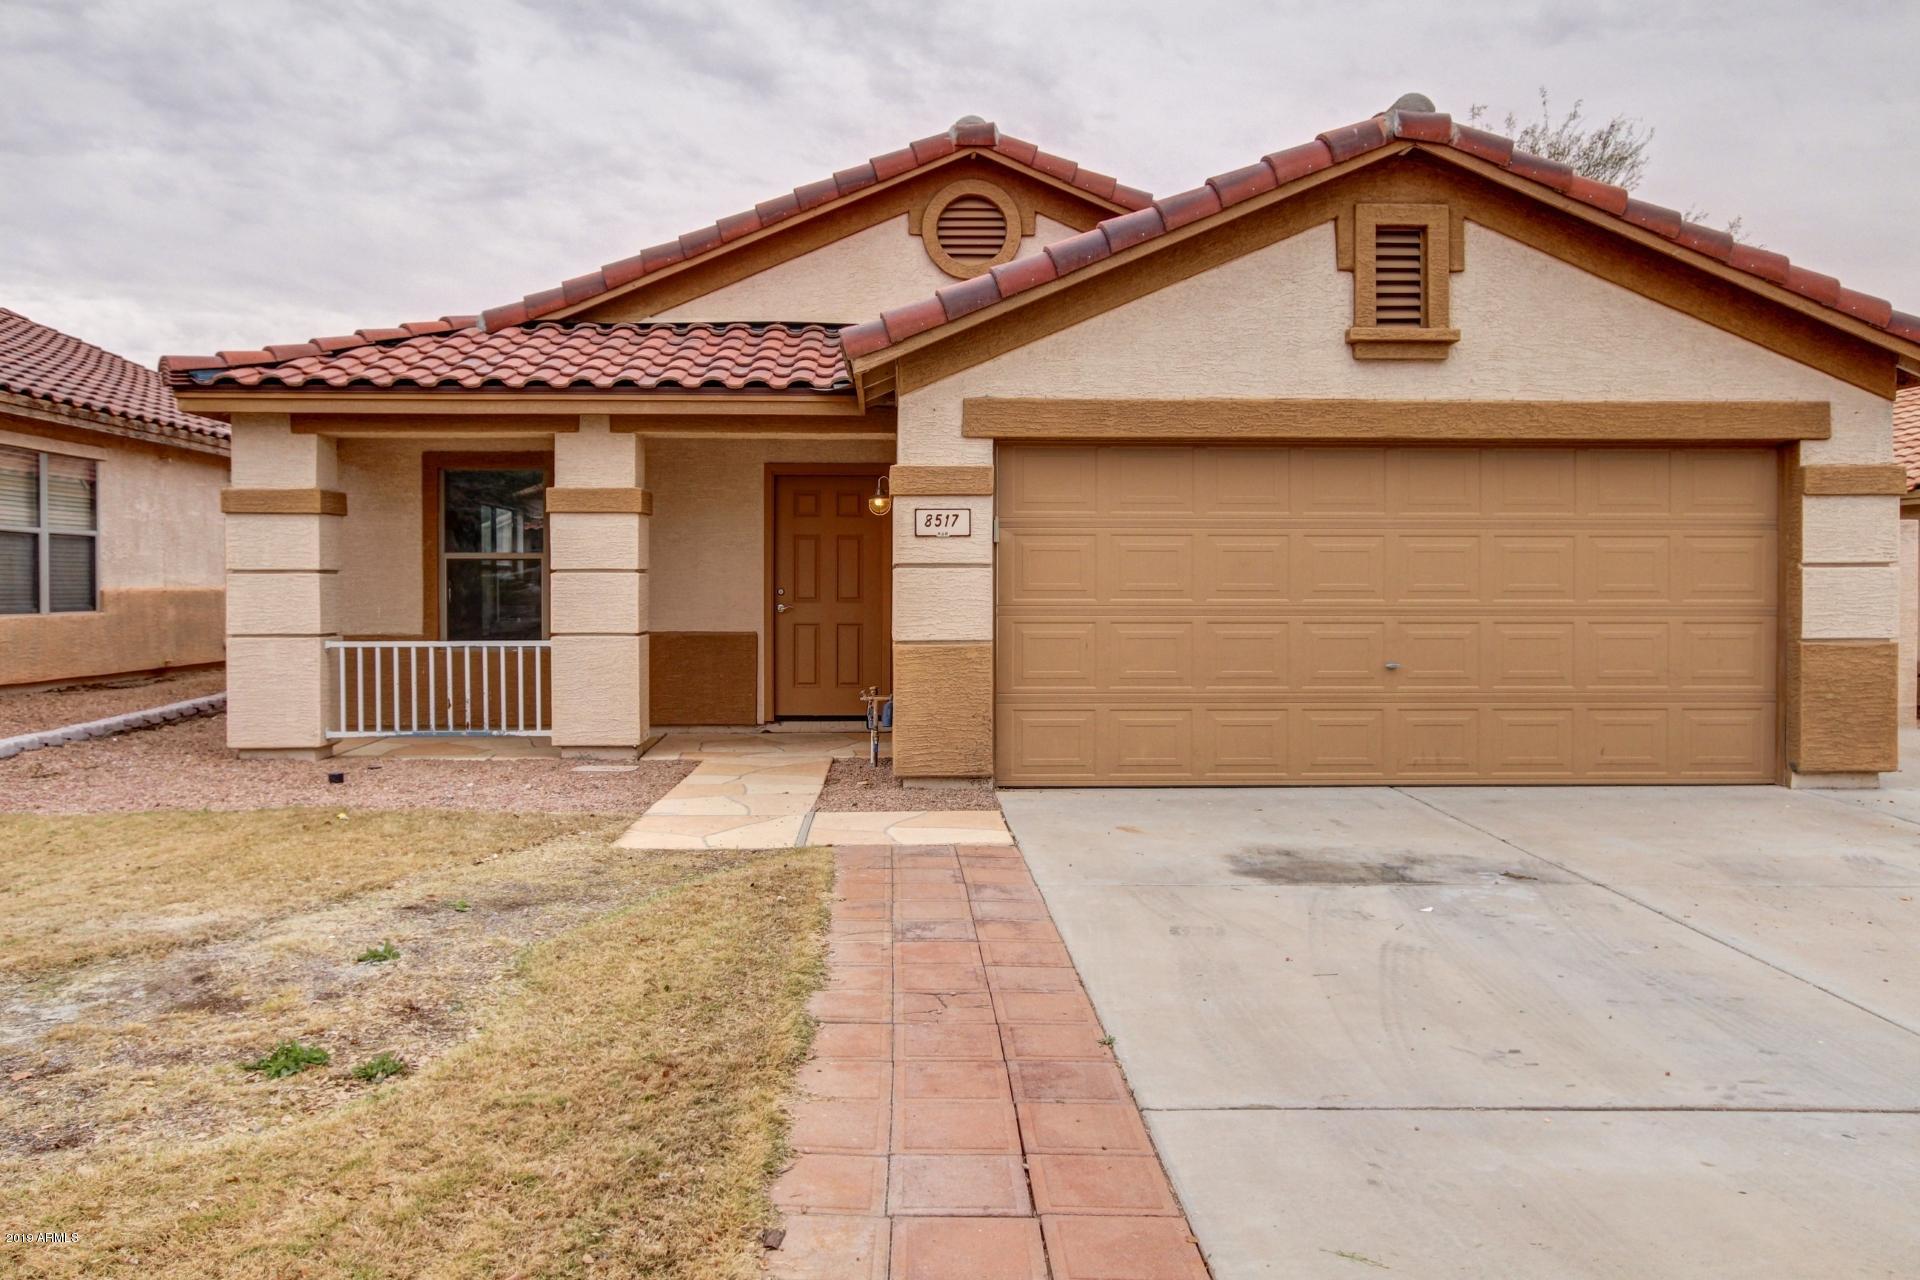 Photo of 8517 E MESETO Avenue, Mesa, AZ 85209